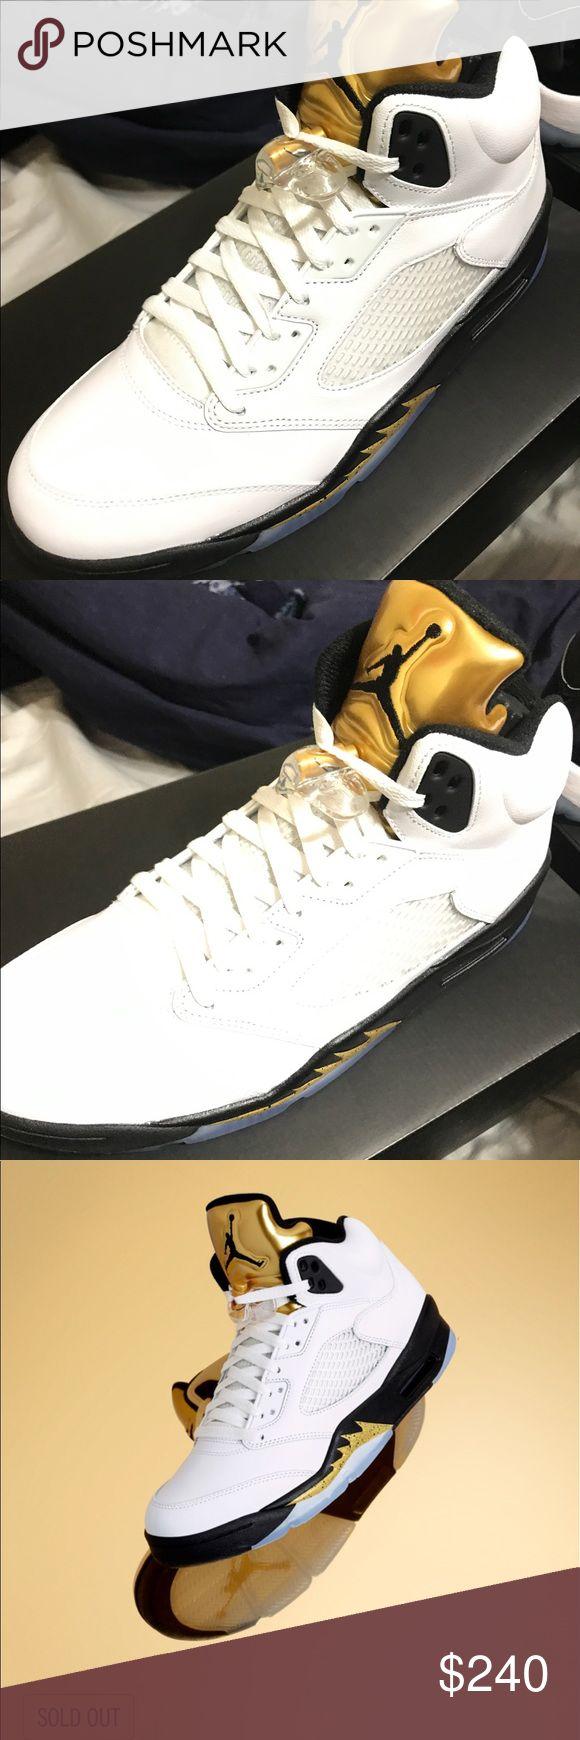 Jordan retro 5 metallic gold Brand new never tried on original all Jordan Shoes Athletic Shoes